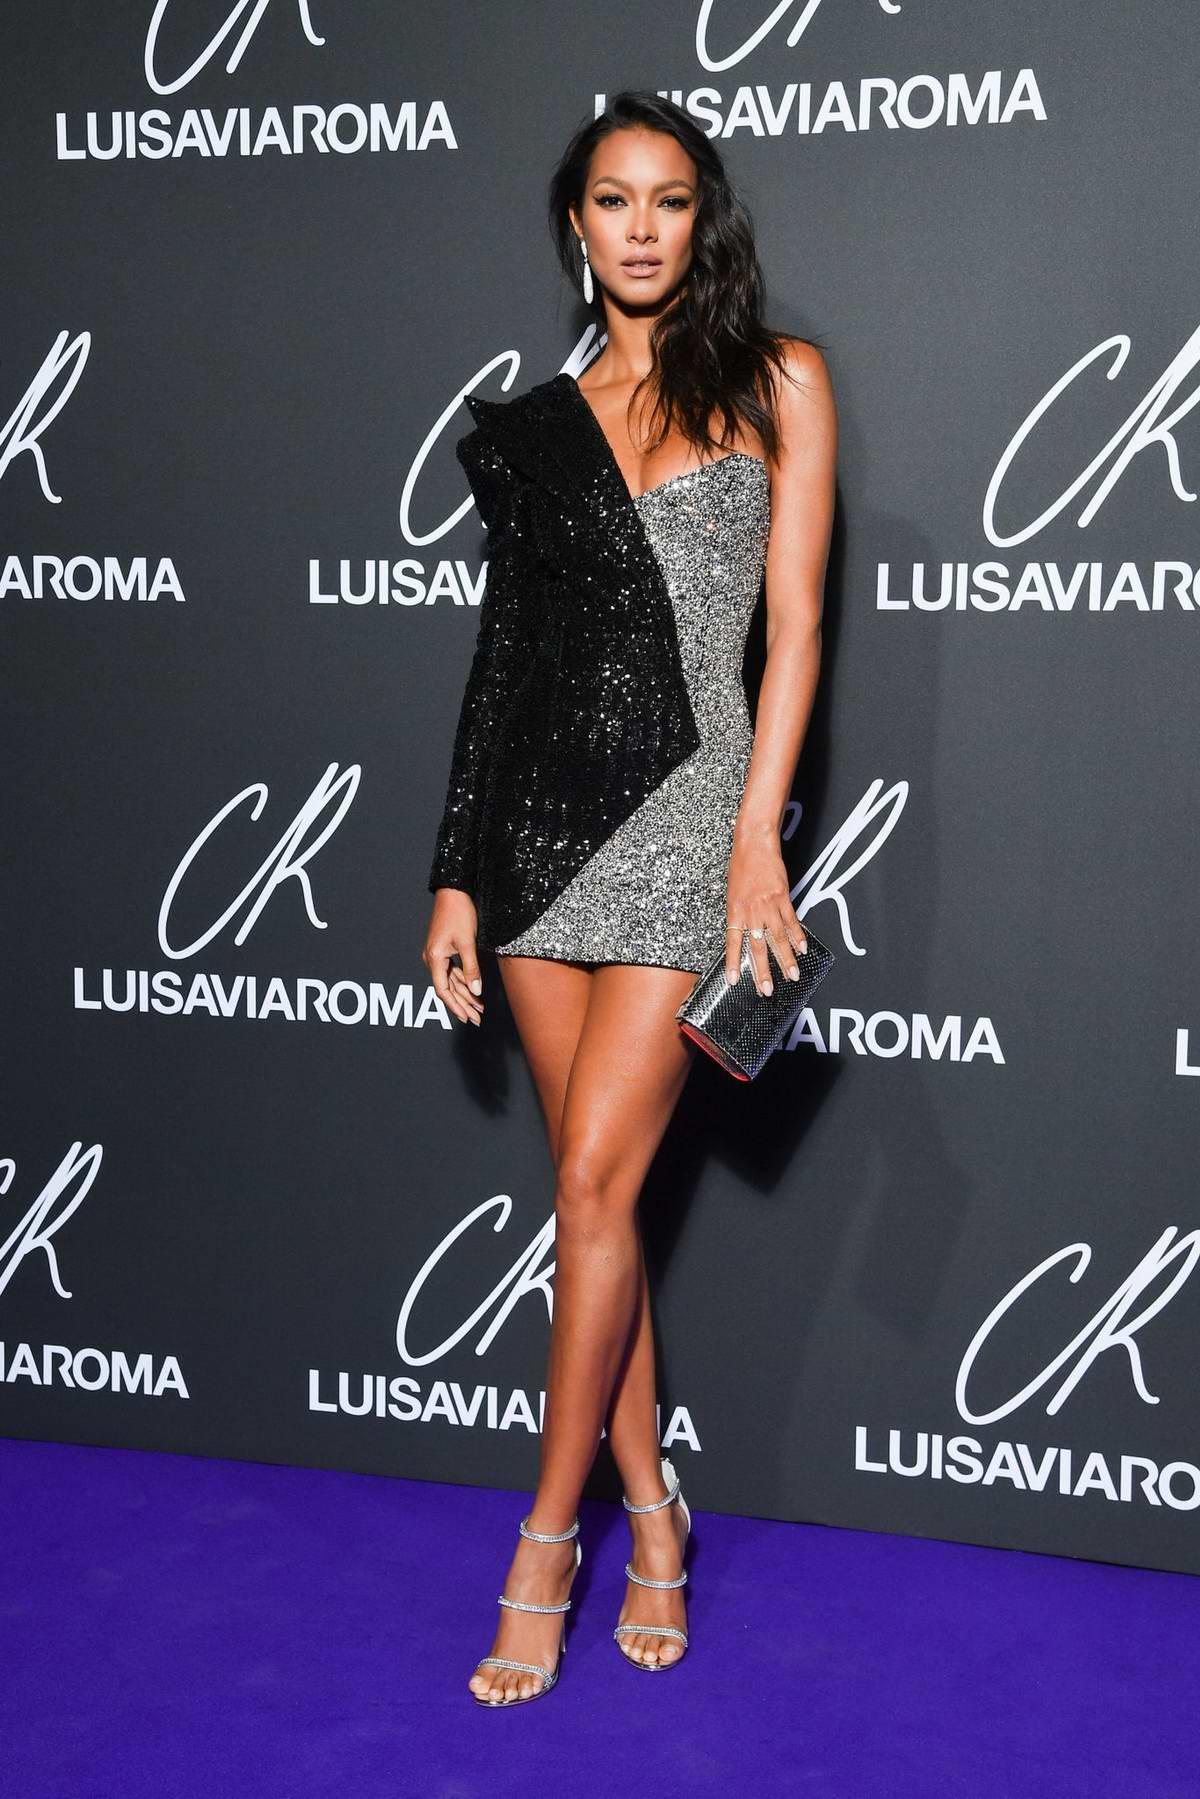 Lais Ribeiro attends the CR Fashion Book x Luisasaviaroma photocall during Paris Fashion Week in Paris, France